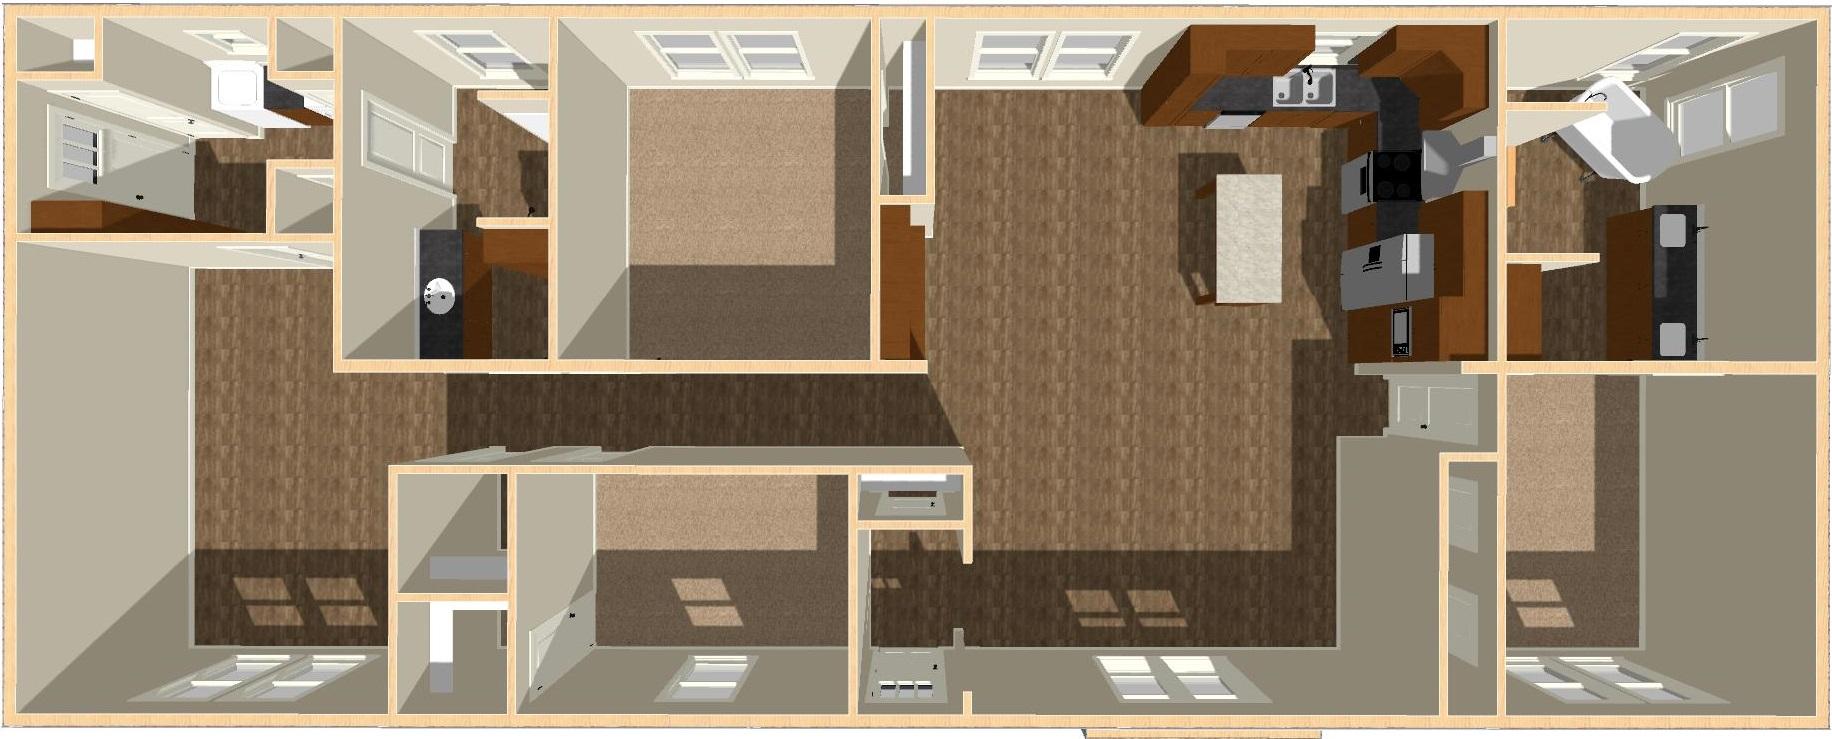 7632-17-dollhouse-1.jpg